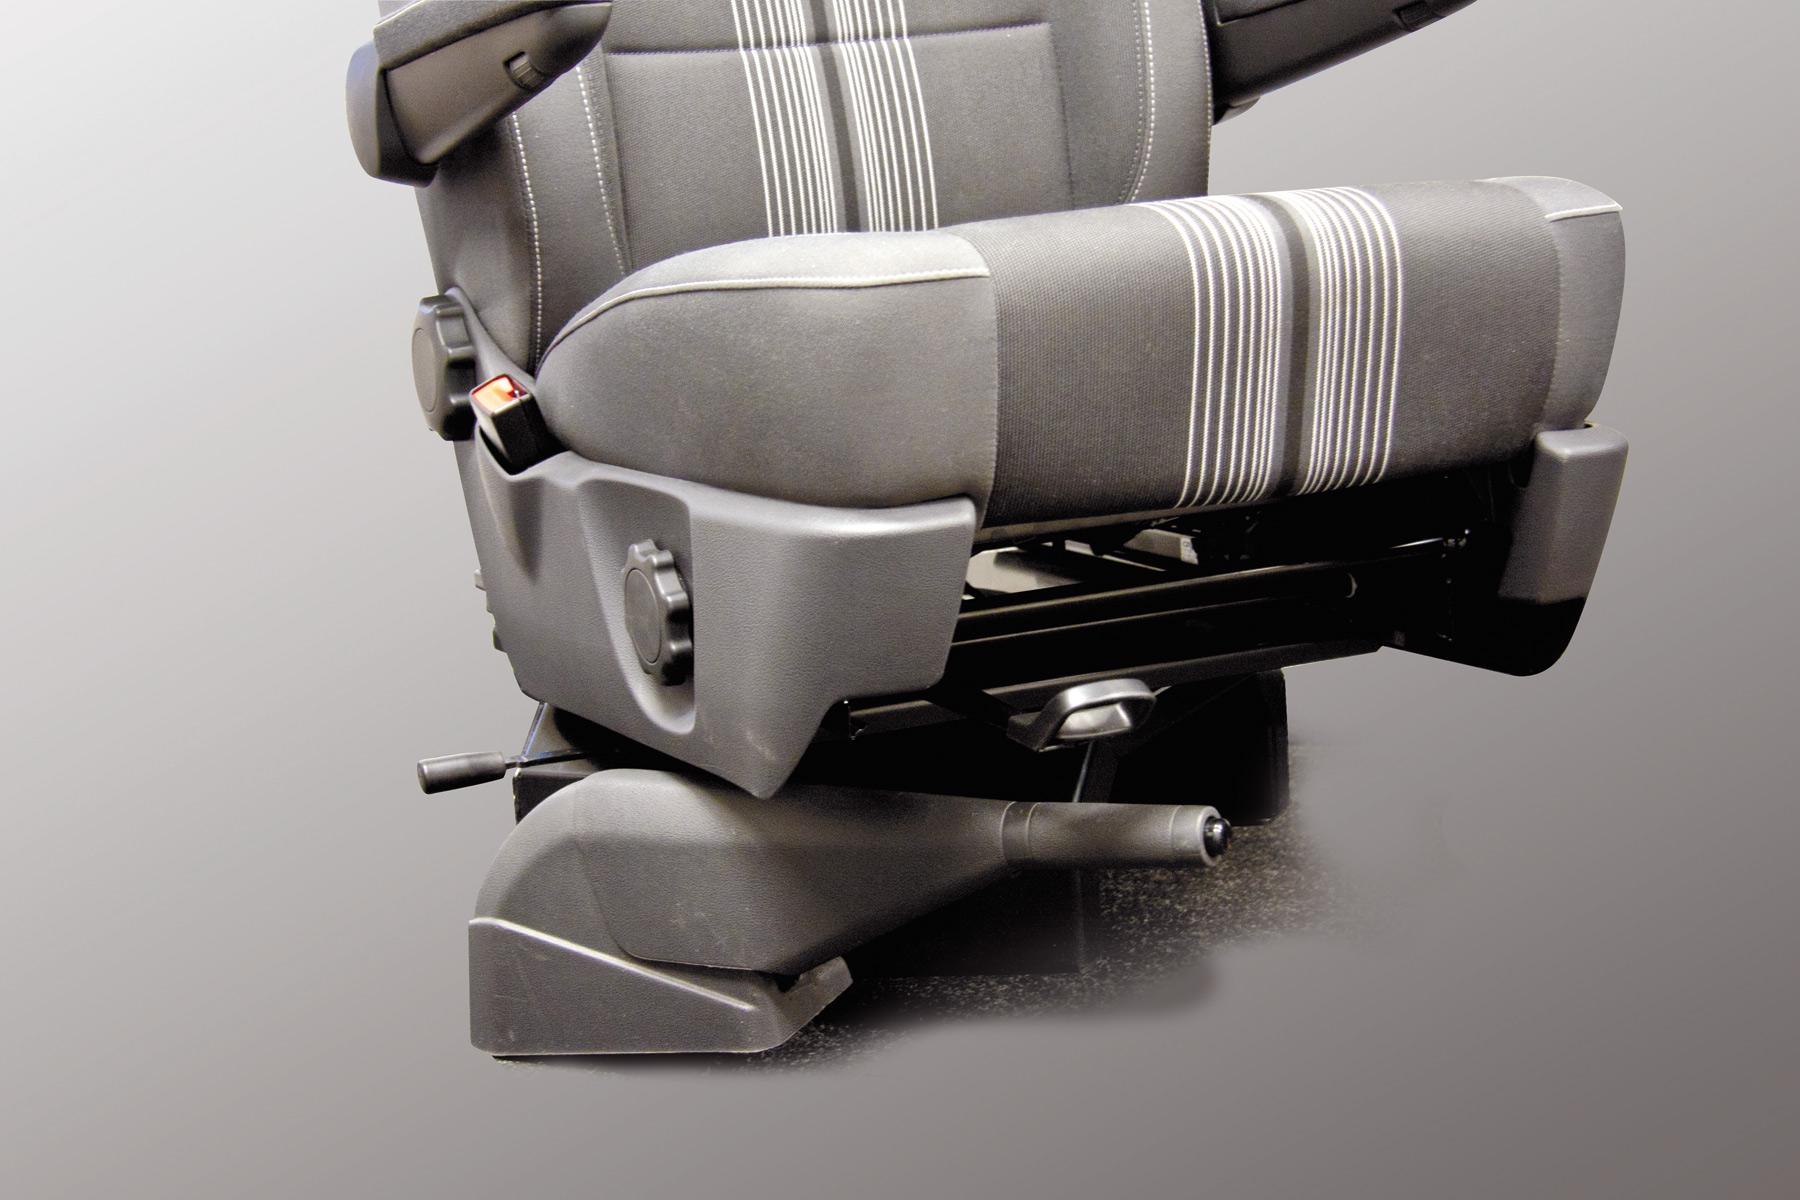 innovative drehkonsole f r vw t5 sitze flexibel. Black Bedroom Furniture Sets. Home Design Ideas